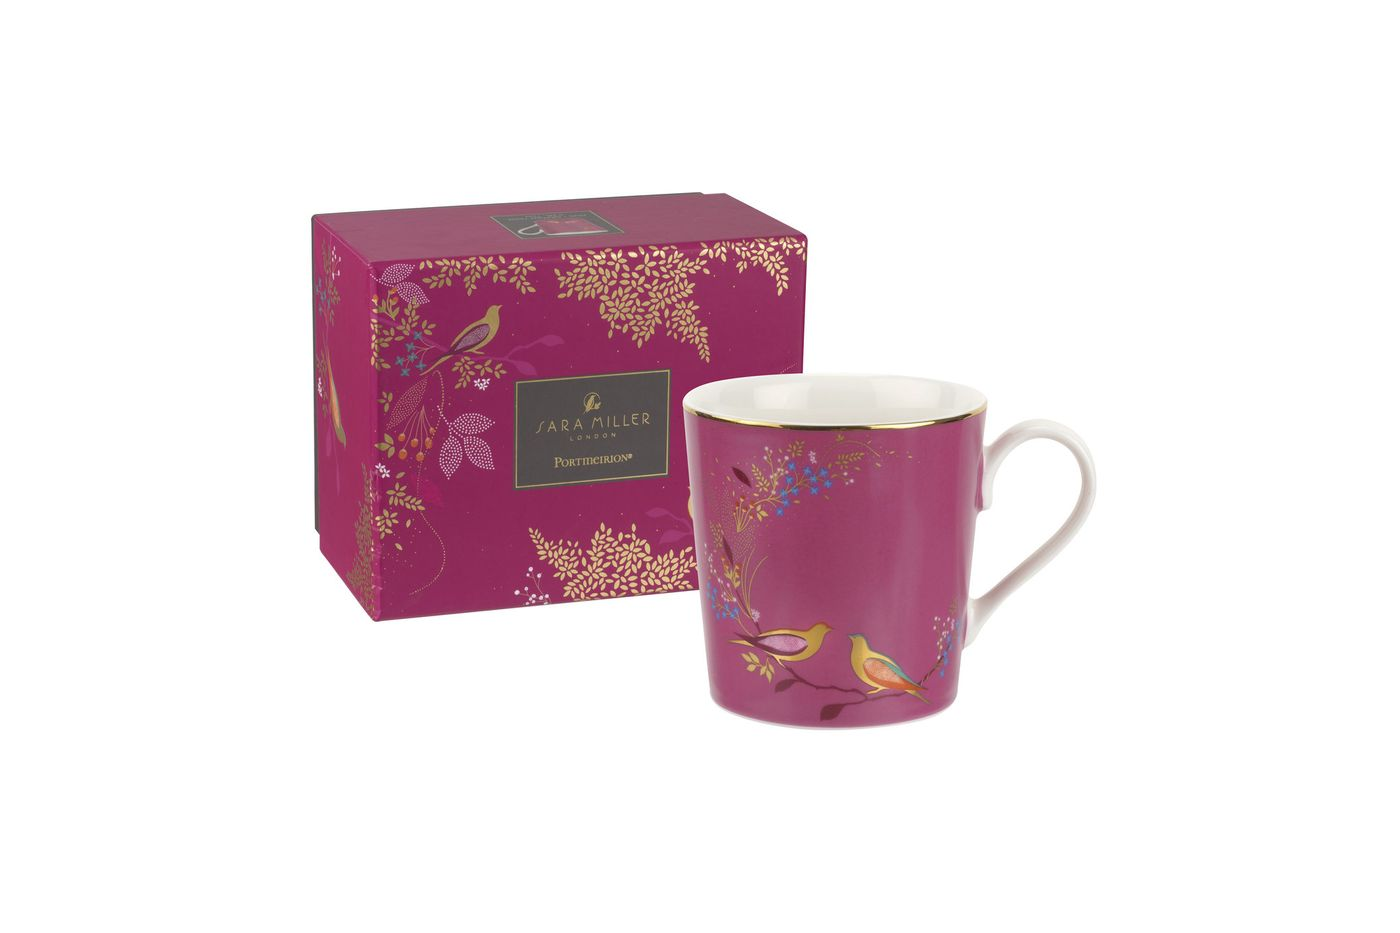 Sara Miller London for Portmeirion Chelsea Collection Mug Pink 0.34l thumb 2